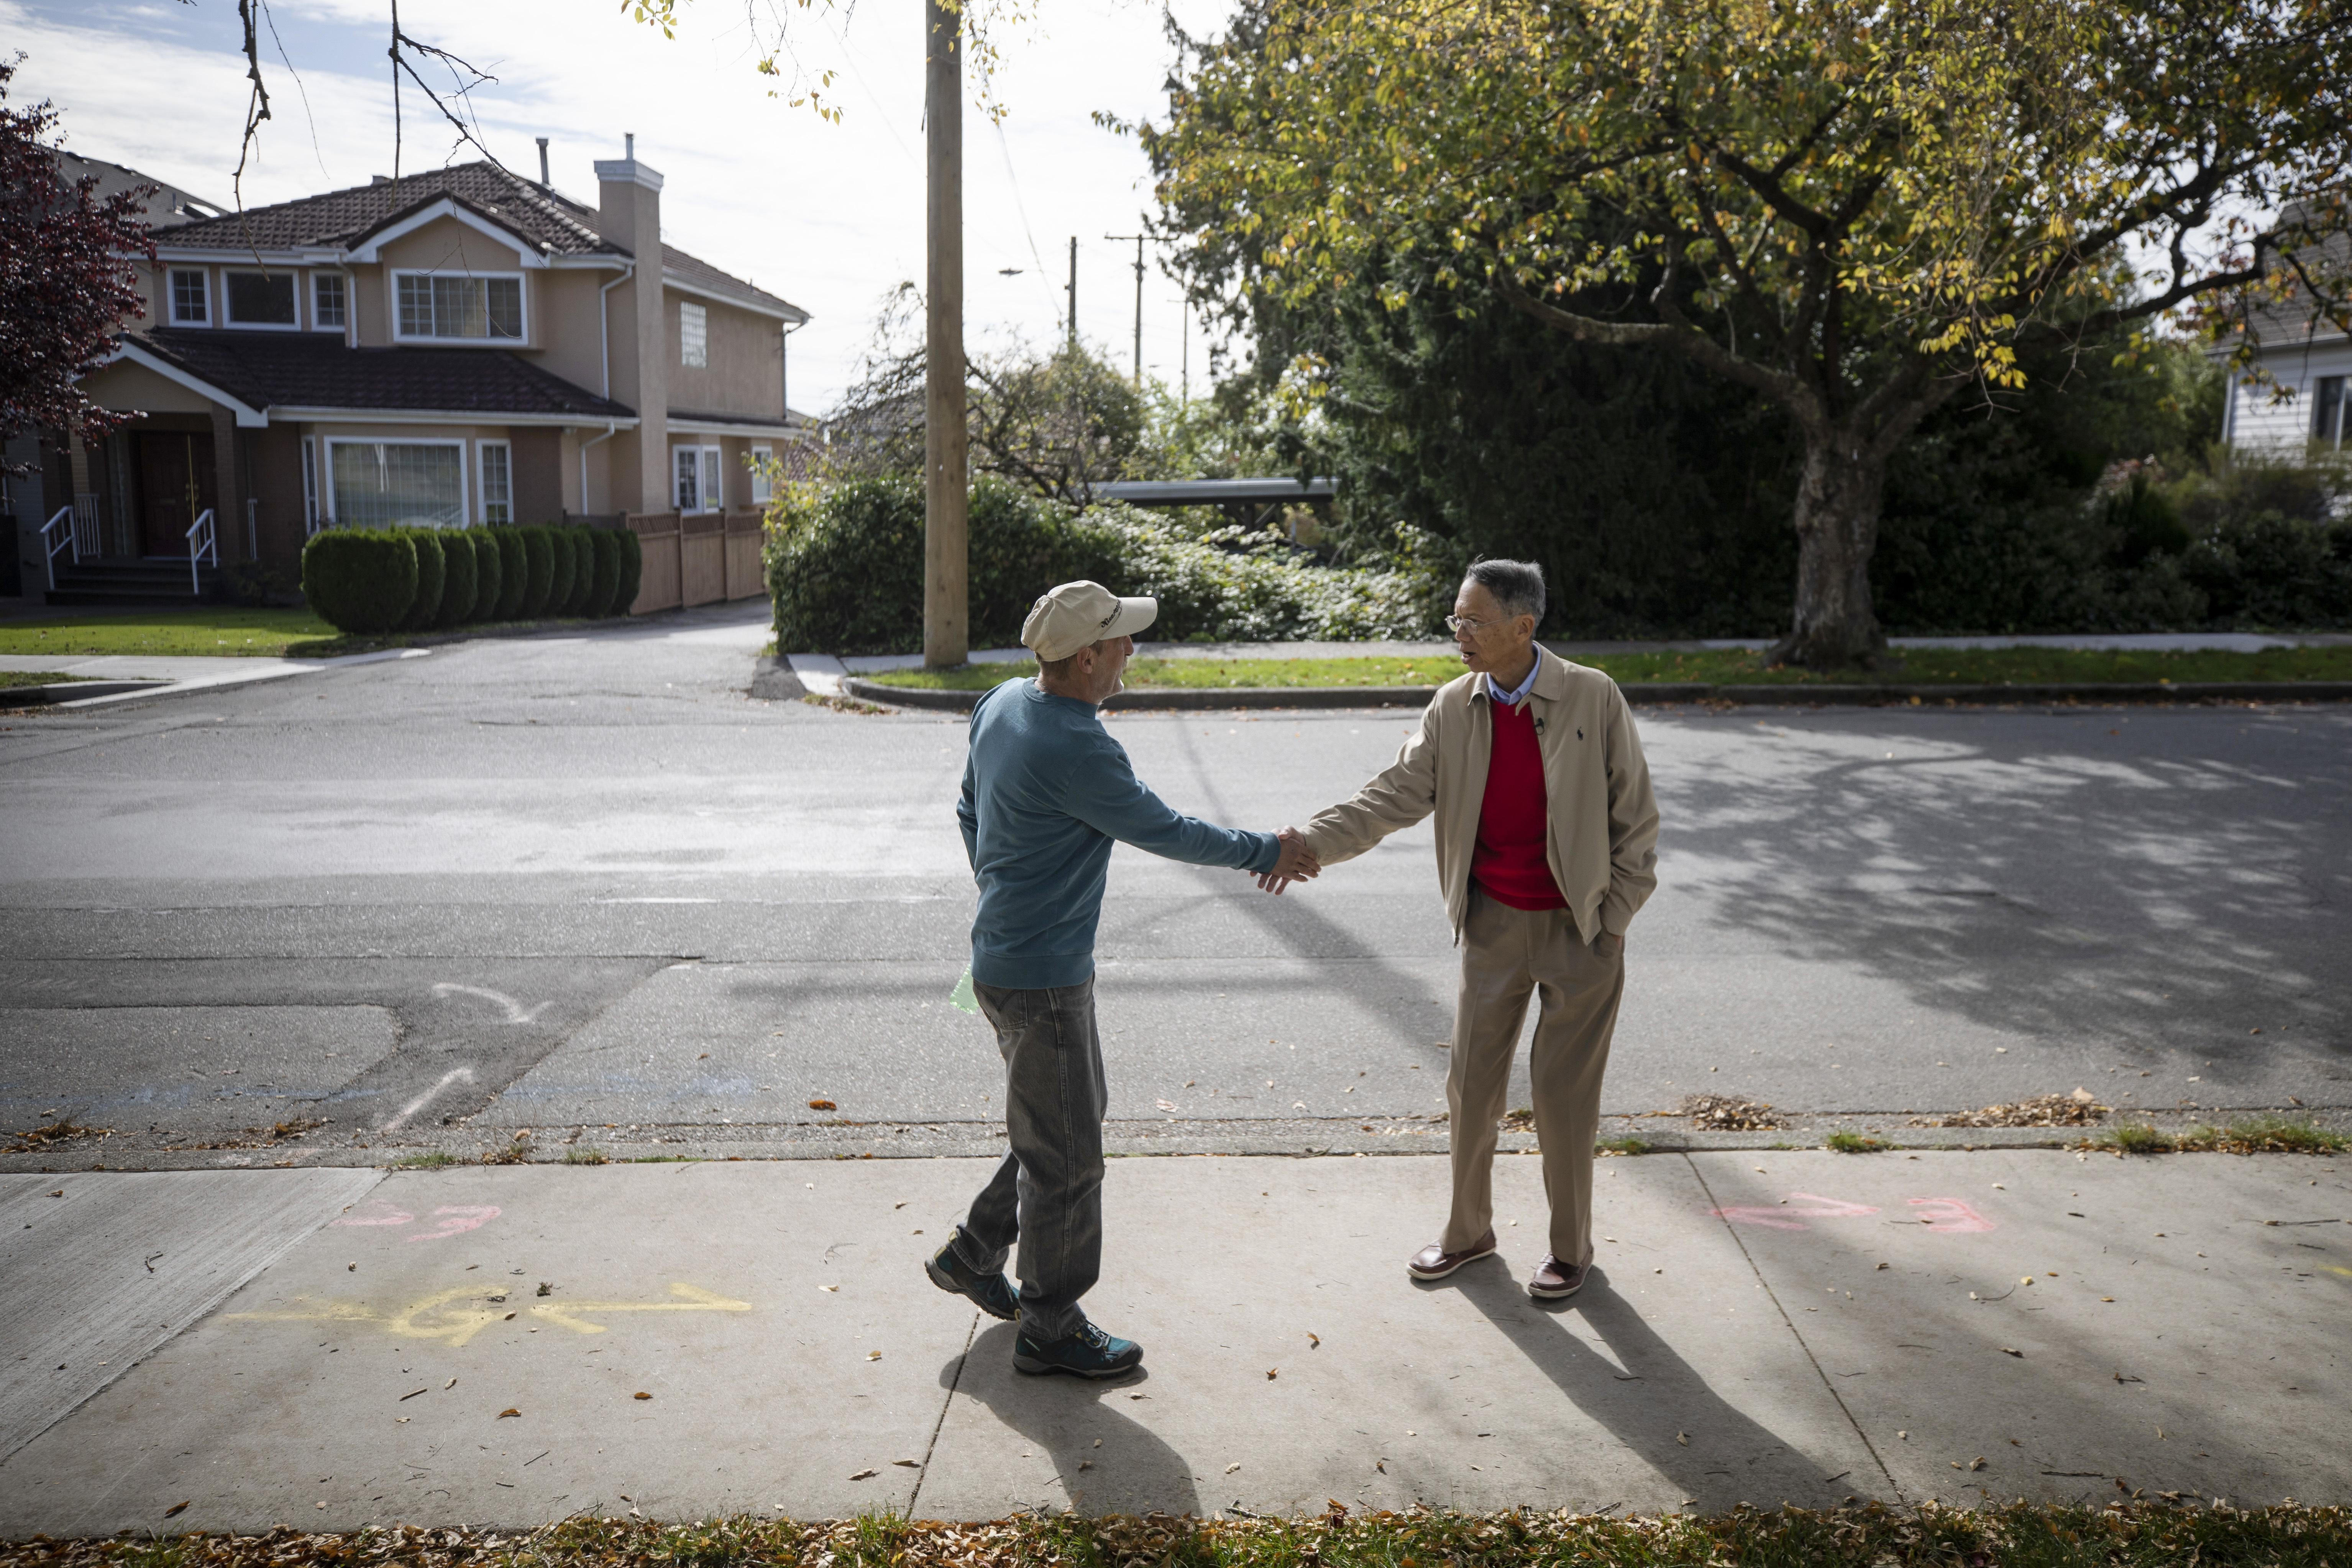 Albert Leung and Charlie Smyth, residents of the Marpole neighbourhood. (Ben Nelms/CBC)